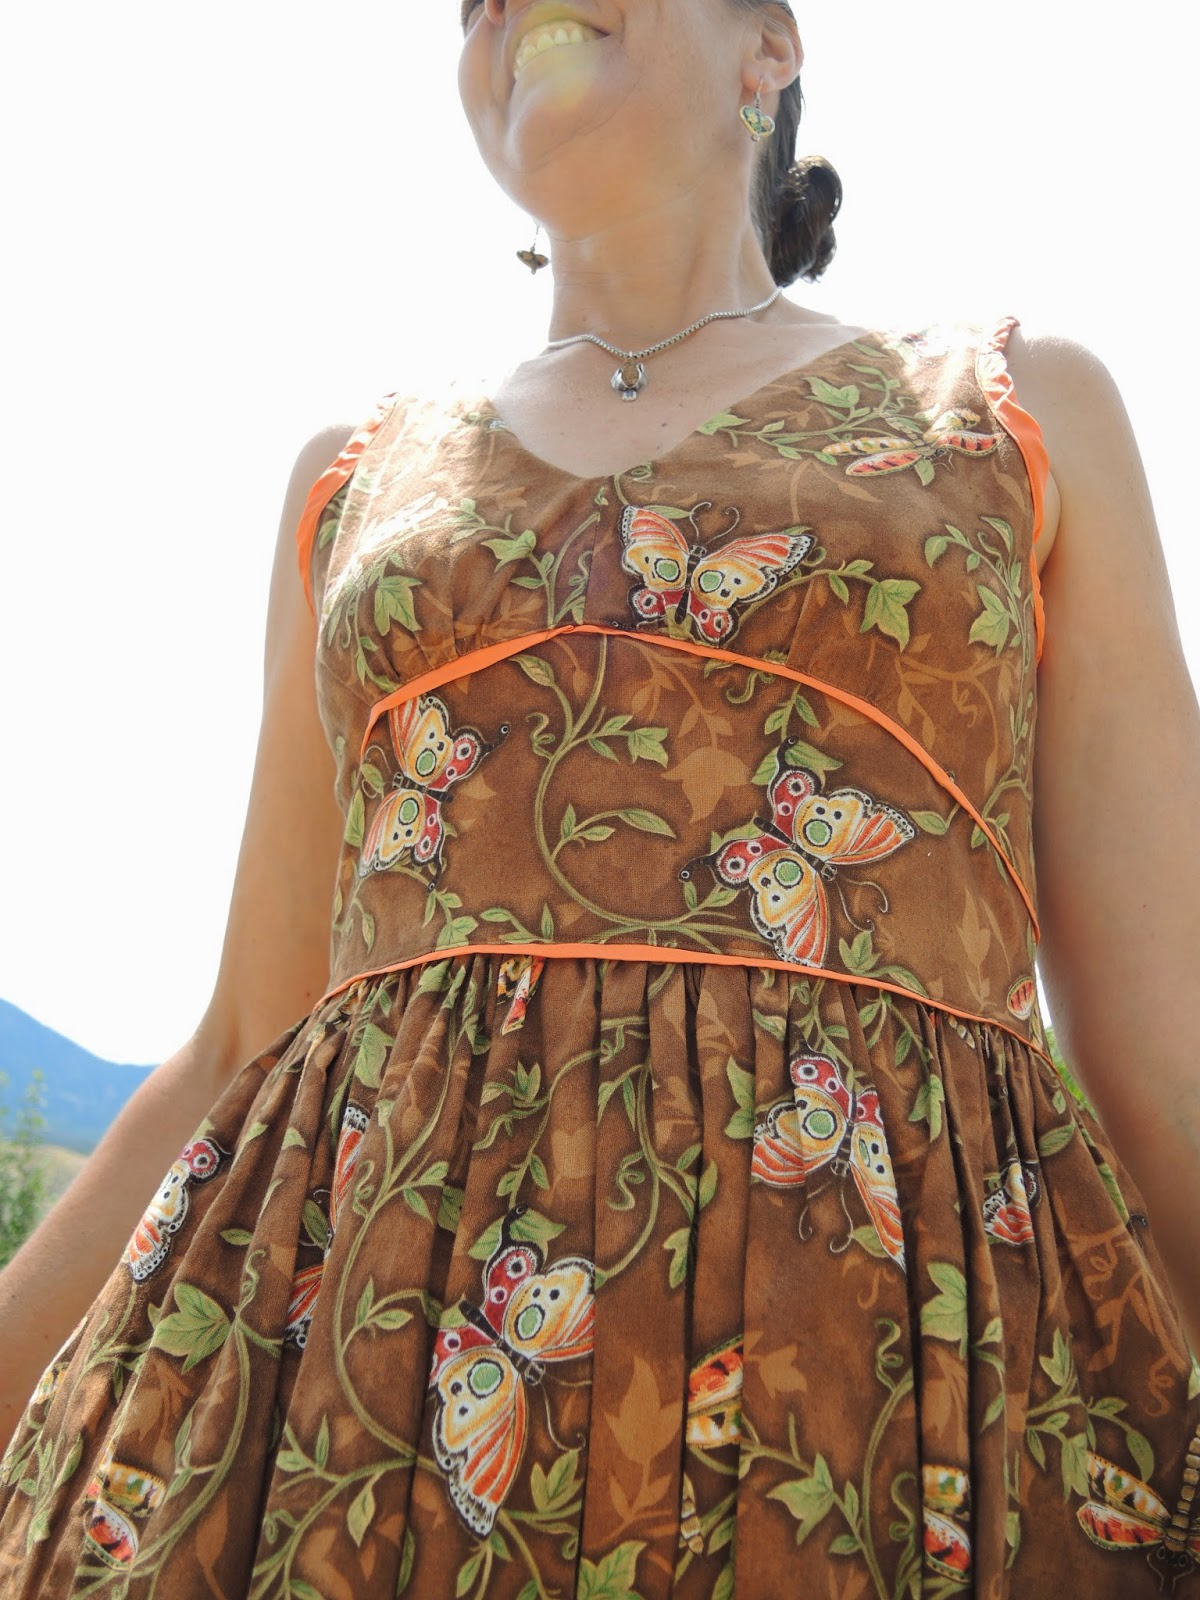 Sew Gadenzia The Marilyn Dress